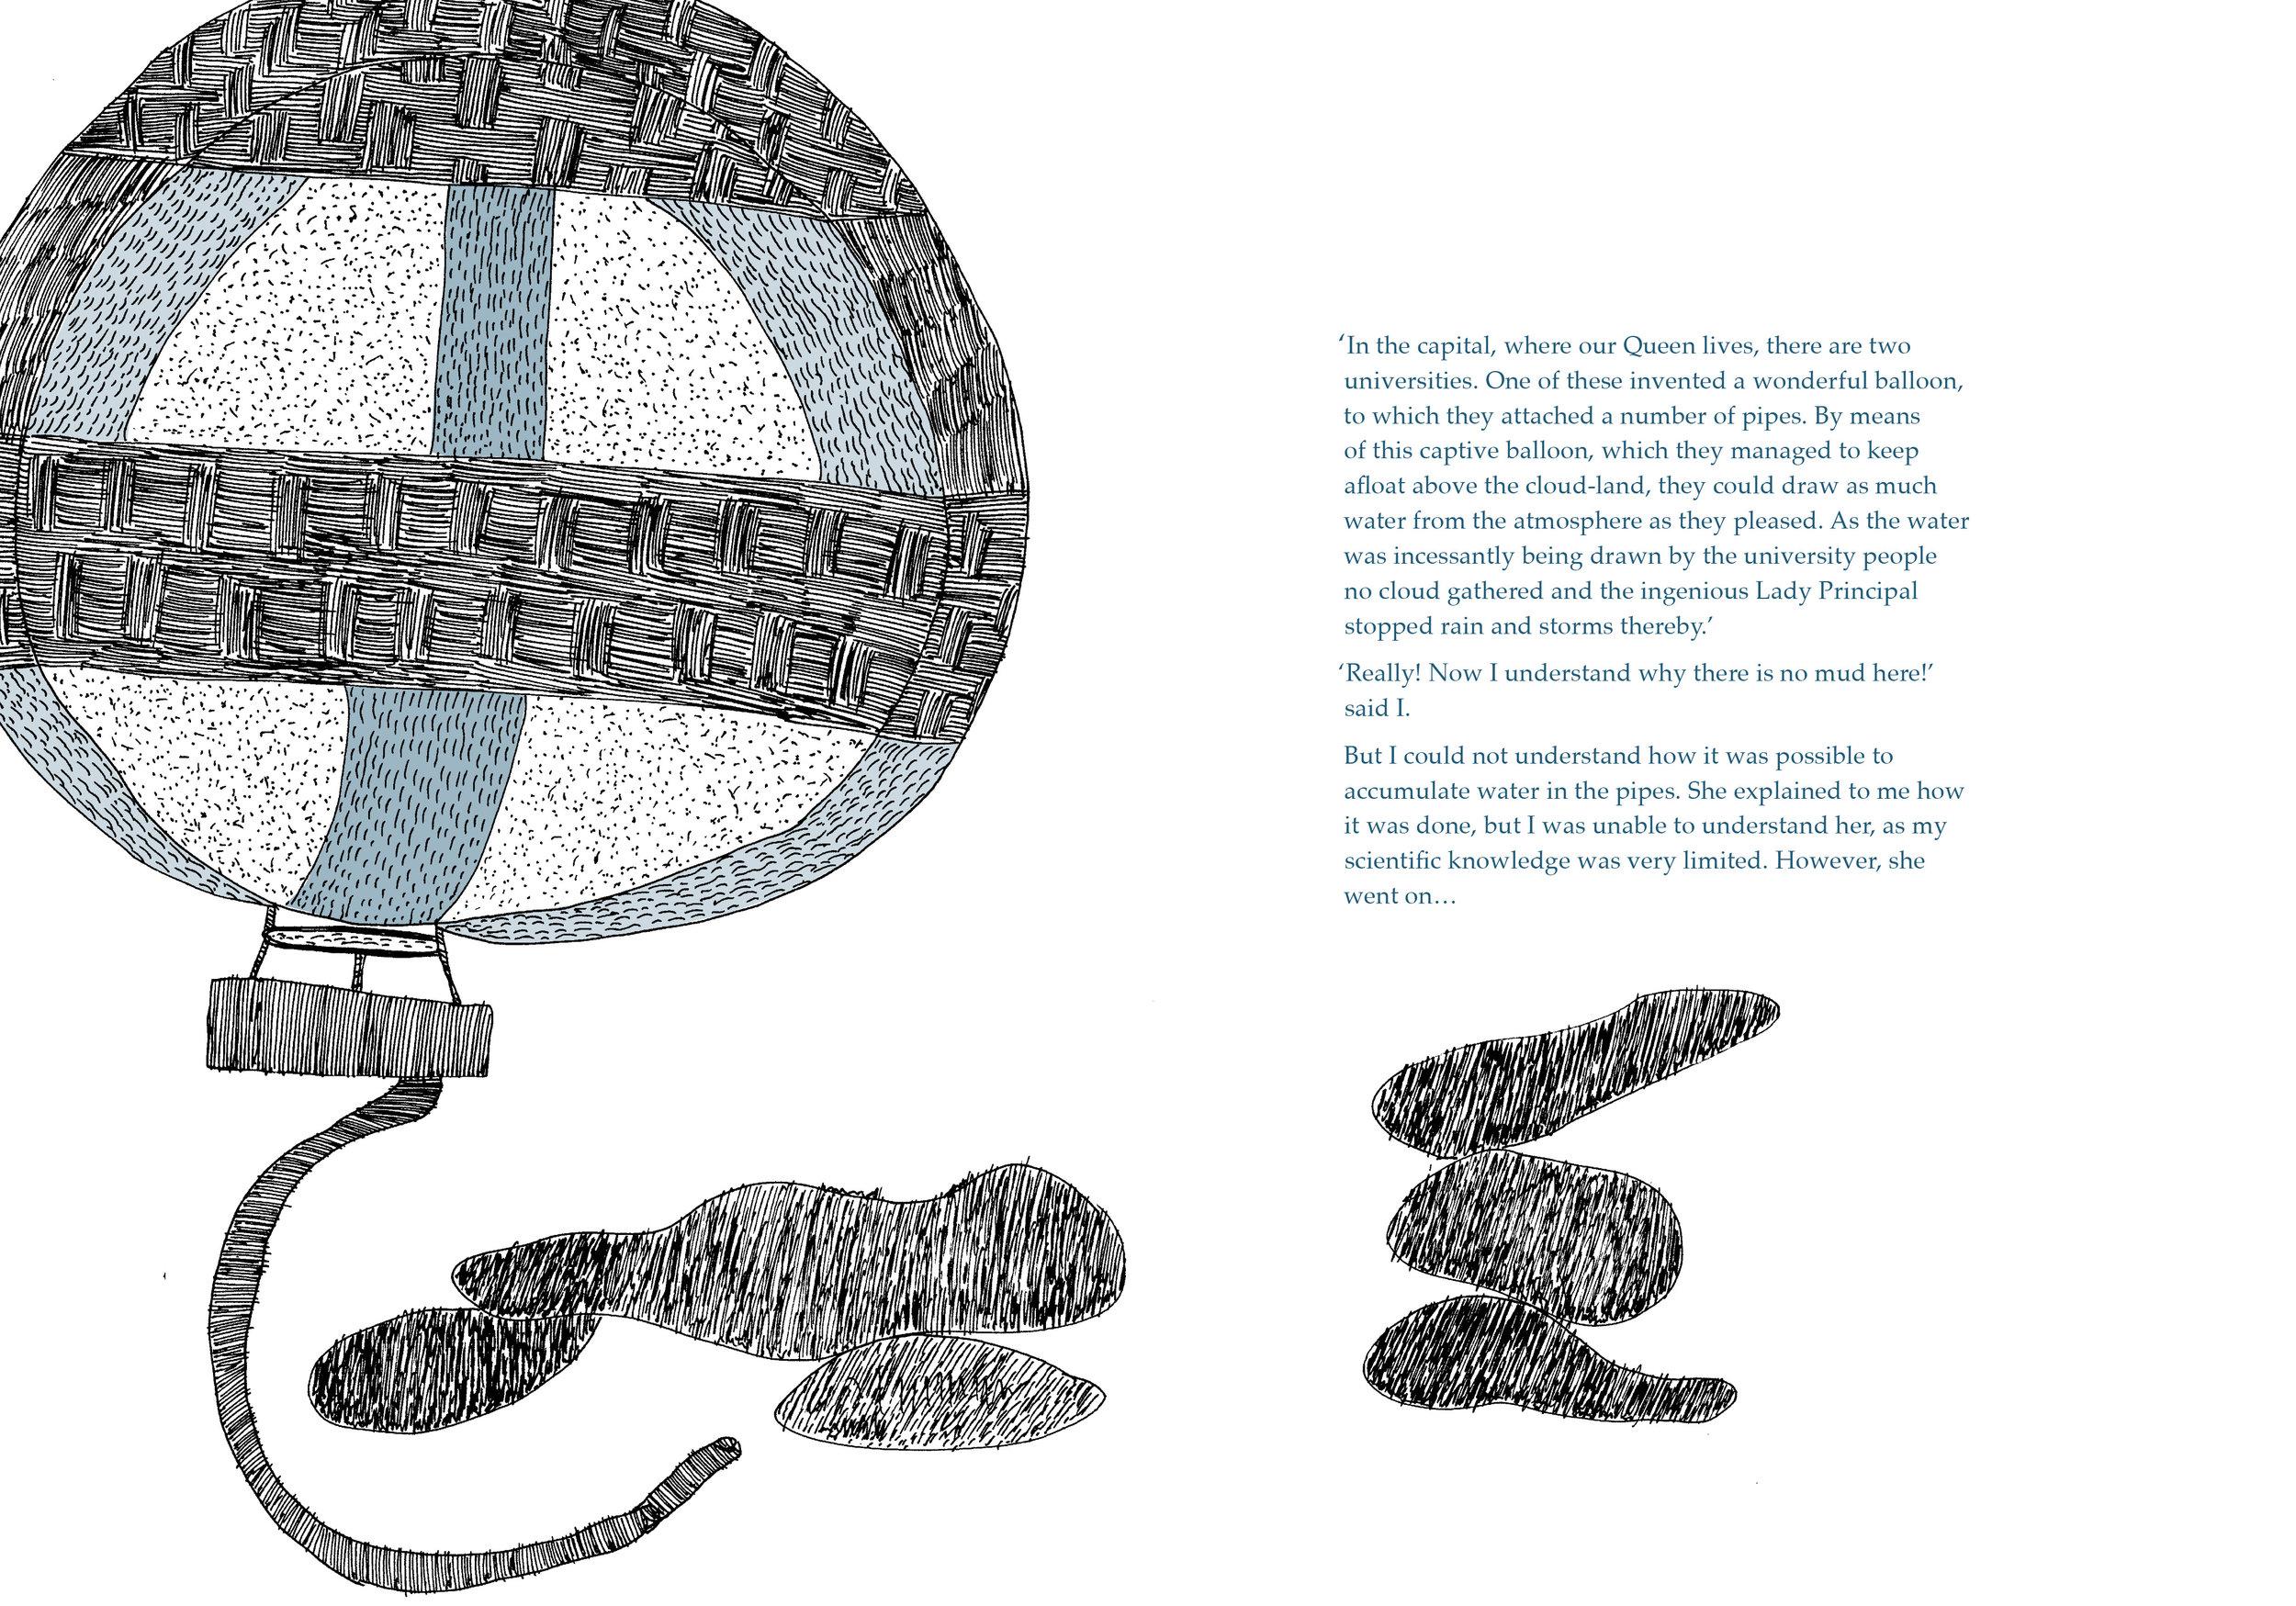 Captive Balloon. Text by Begum Rokheya Sakhawat Hossain and illustrations by Durga Bai for 'Sultana's Dream.' Original Edition ©️Tara Books Pvt Ltd, Chennai, India www.tarabooks.com.